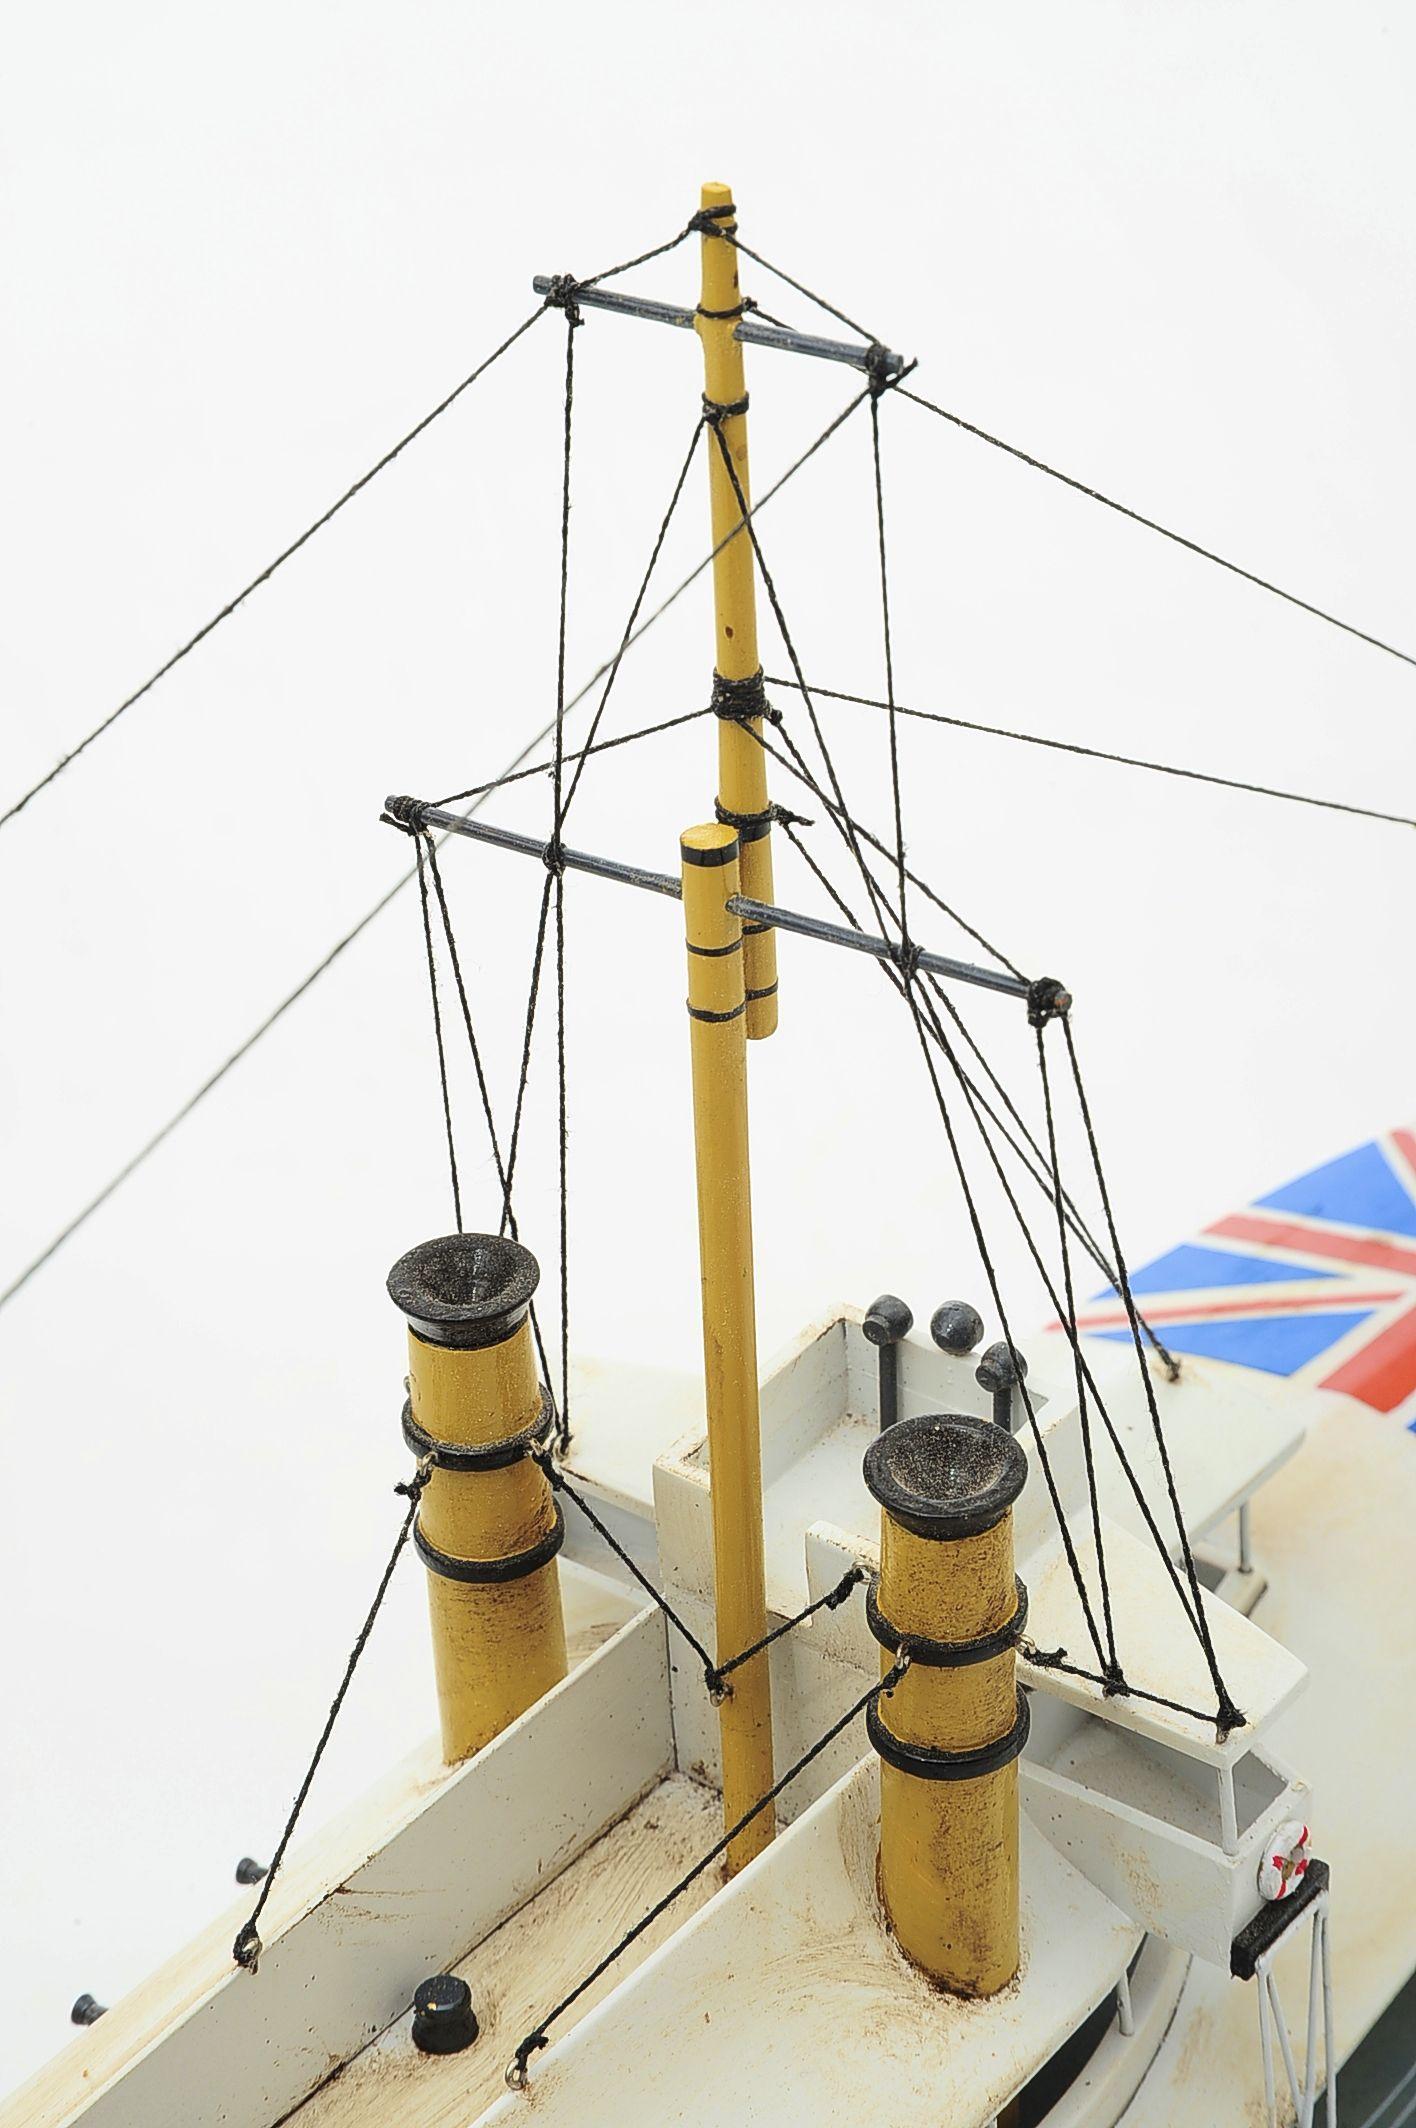 1392-6183-HMS-Cockchafer-Premier-Range